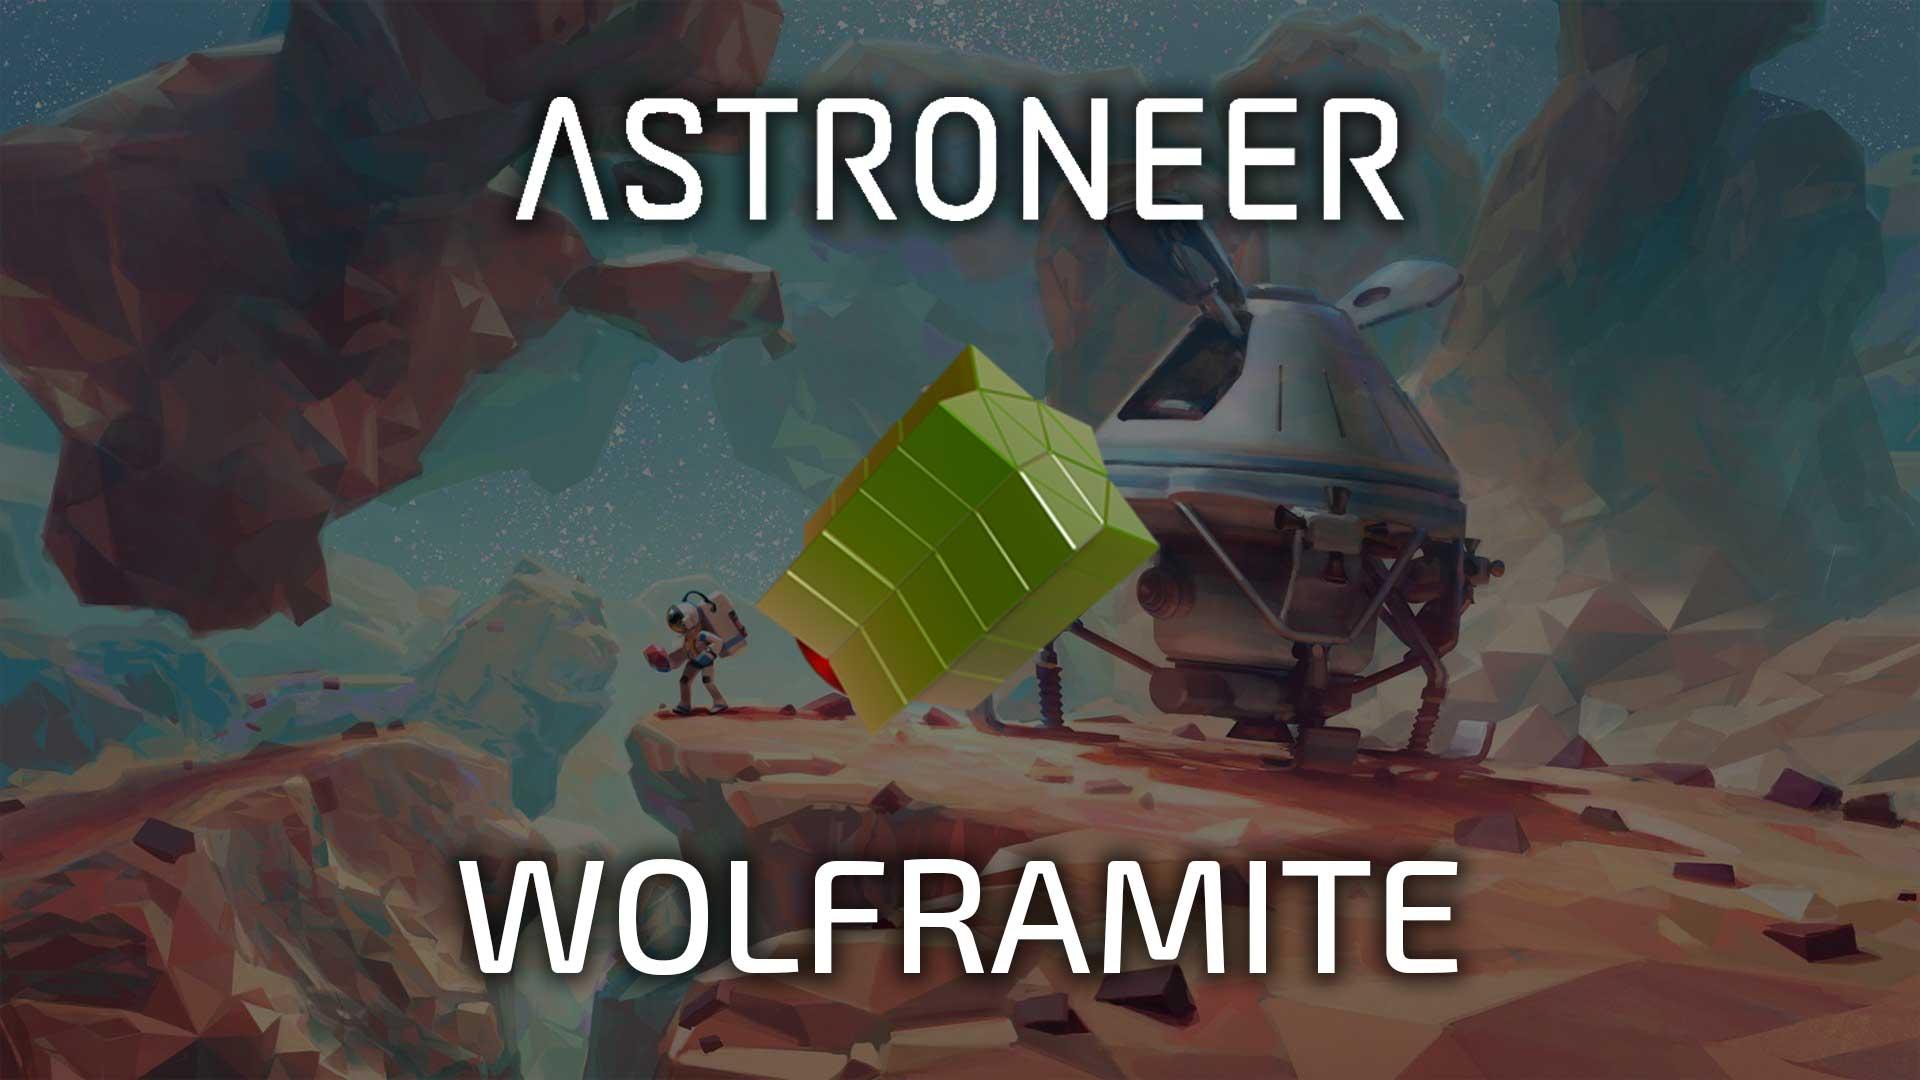 astroneer wolframite